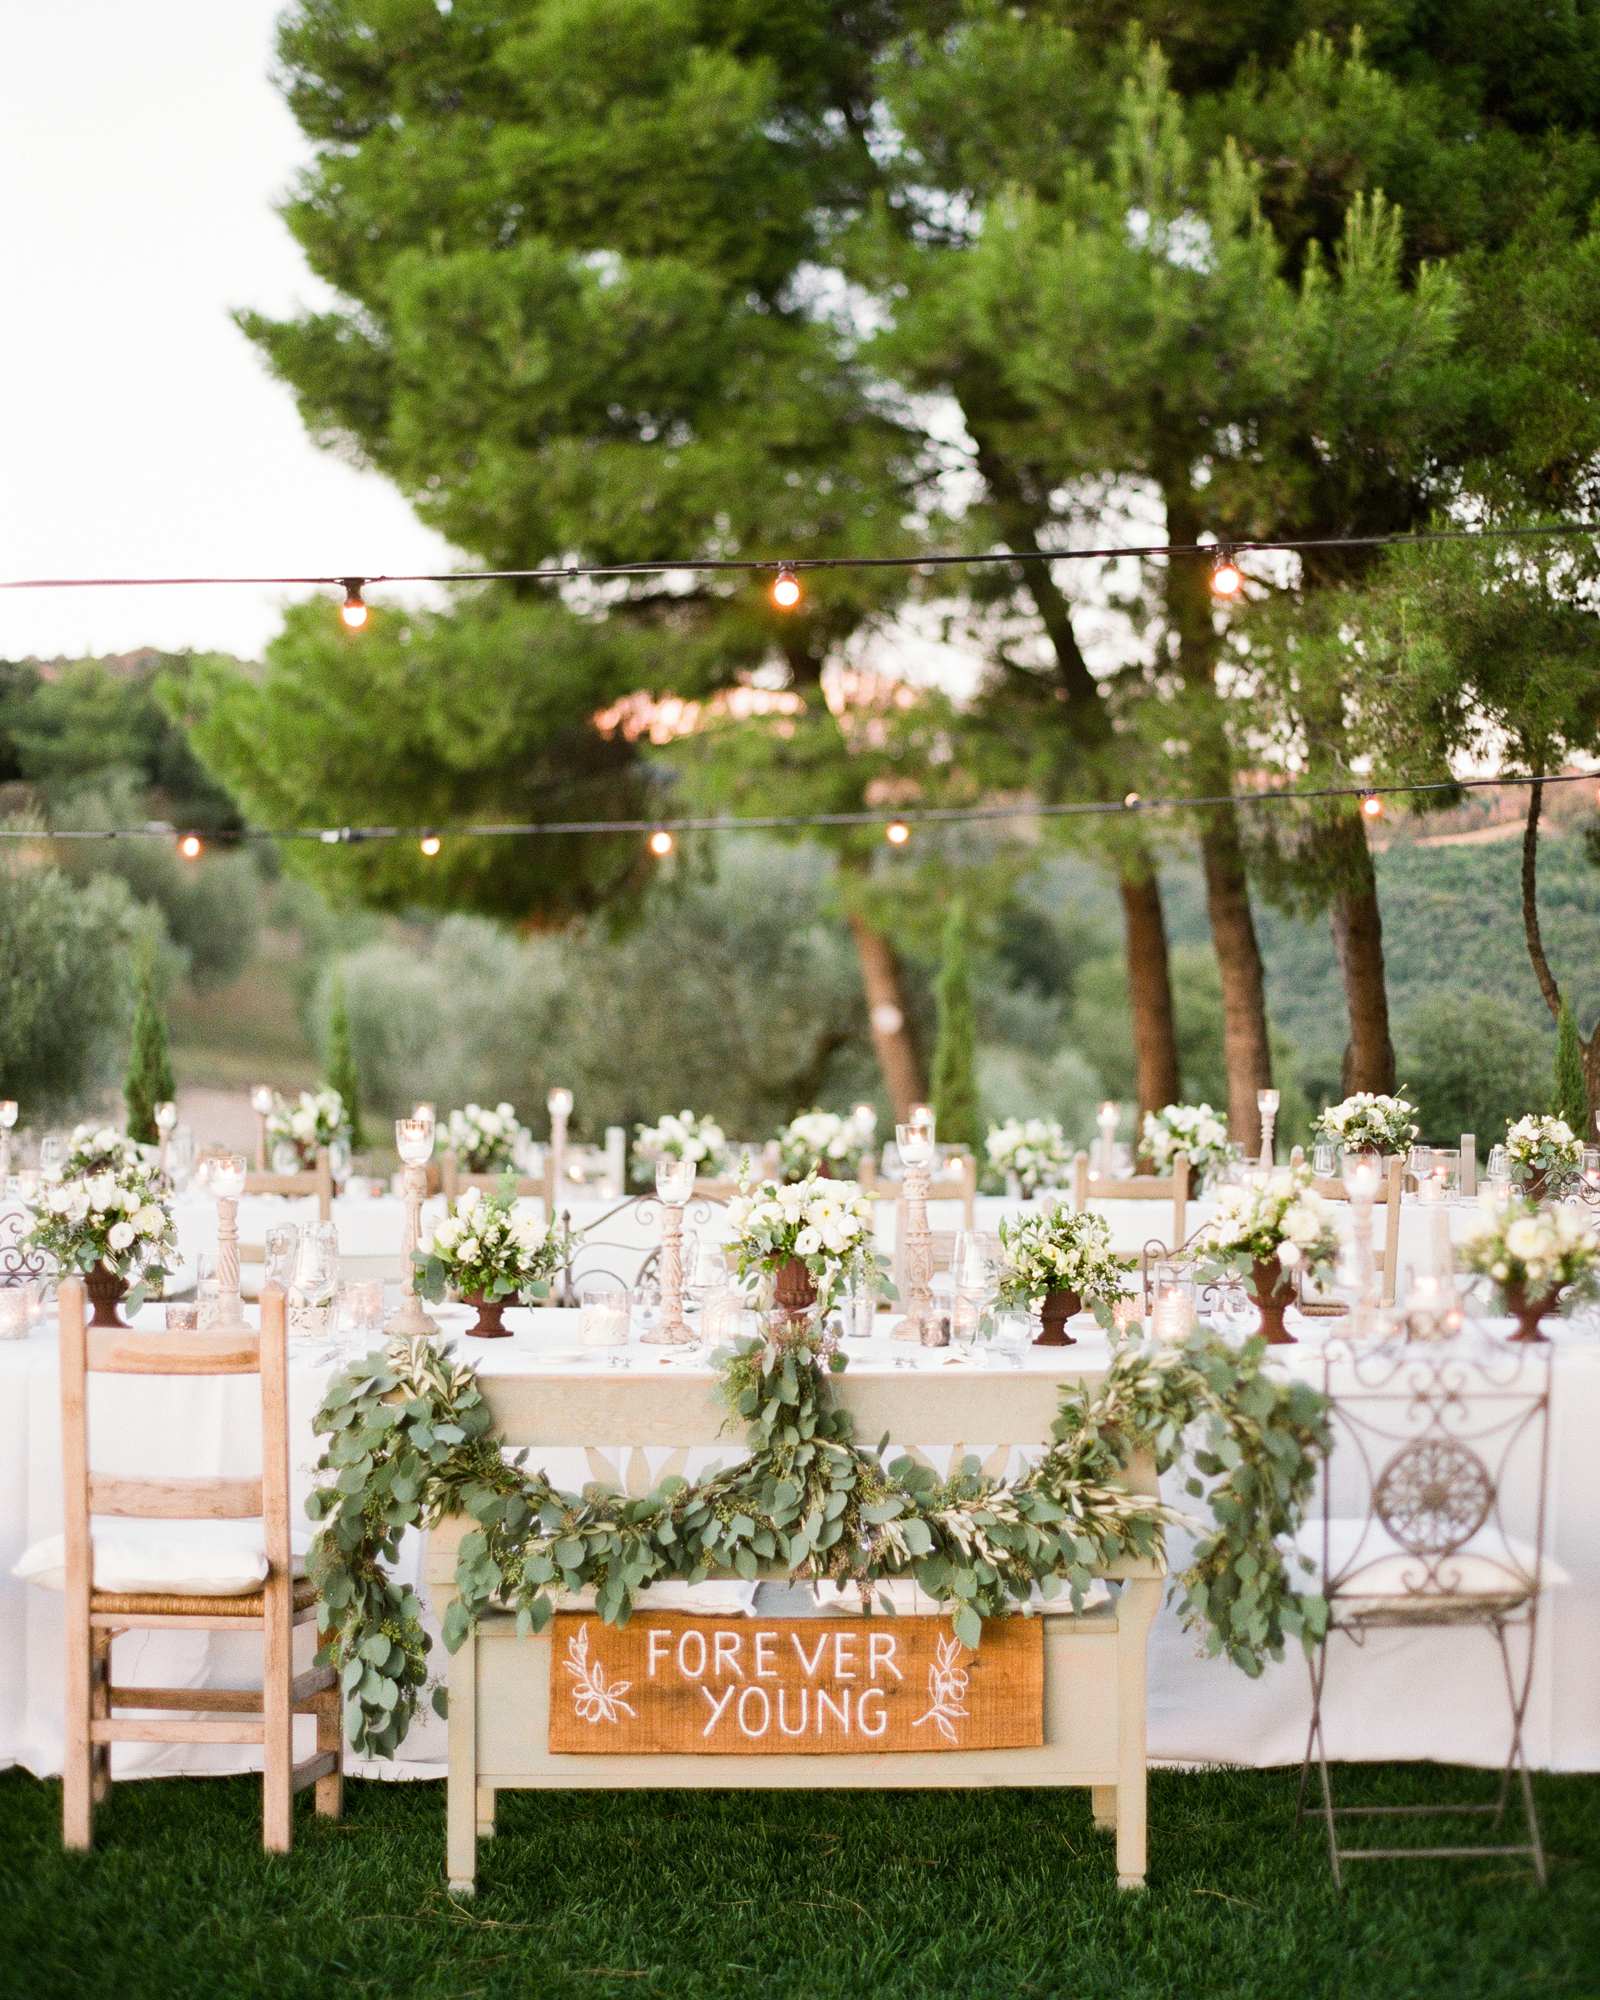 regina-jack-wedding-loveseat-67-s111820-0215.jpg